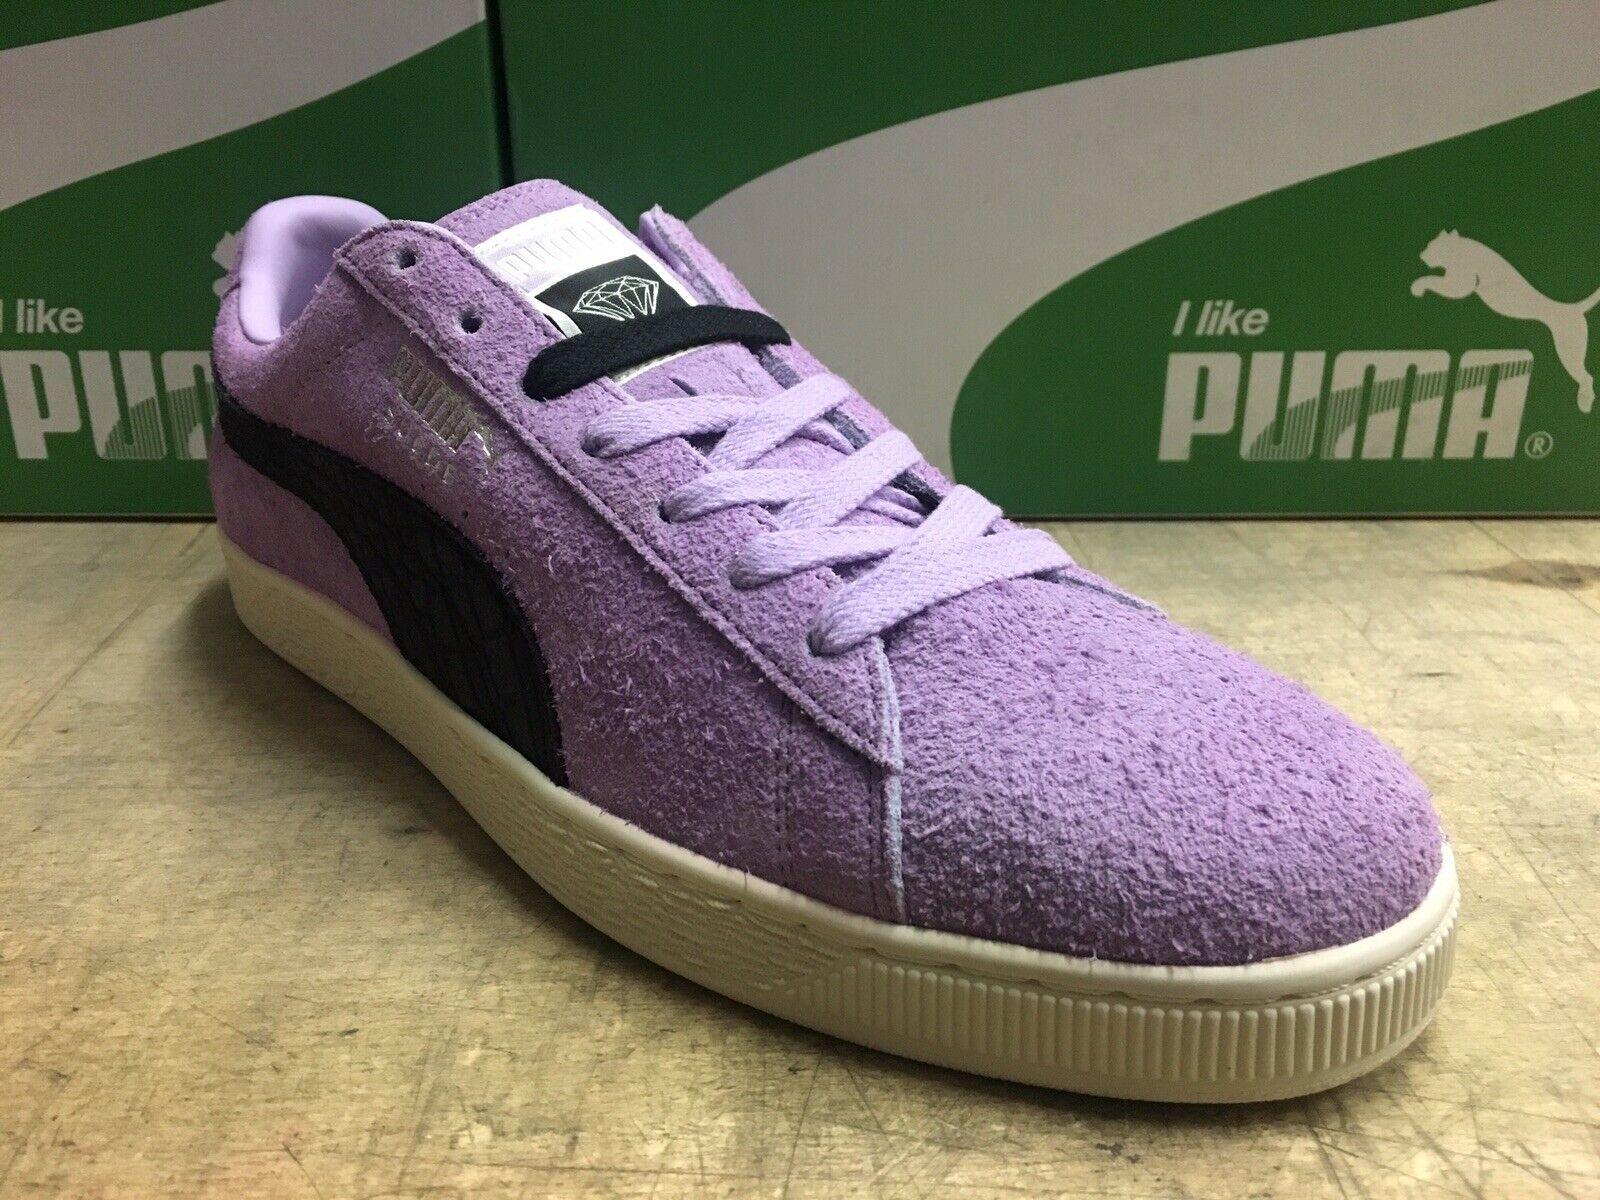 Мужская спортивная обувь DIAMOND SUPPLY CO X PUMA ORCHID BLOOM PUMA BLACK 365650 02 SIZE 10.5US